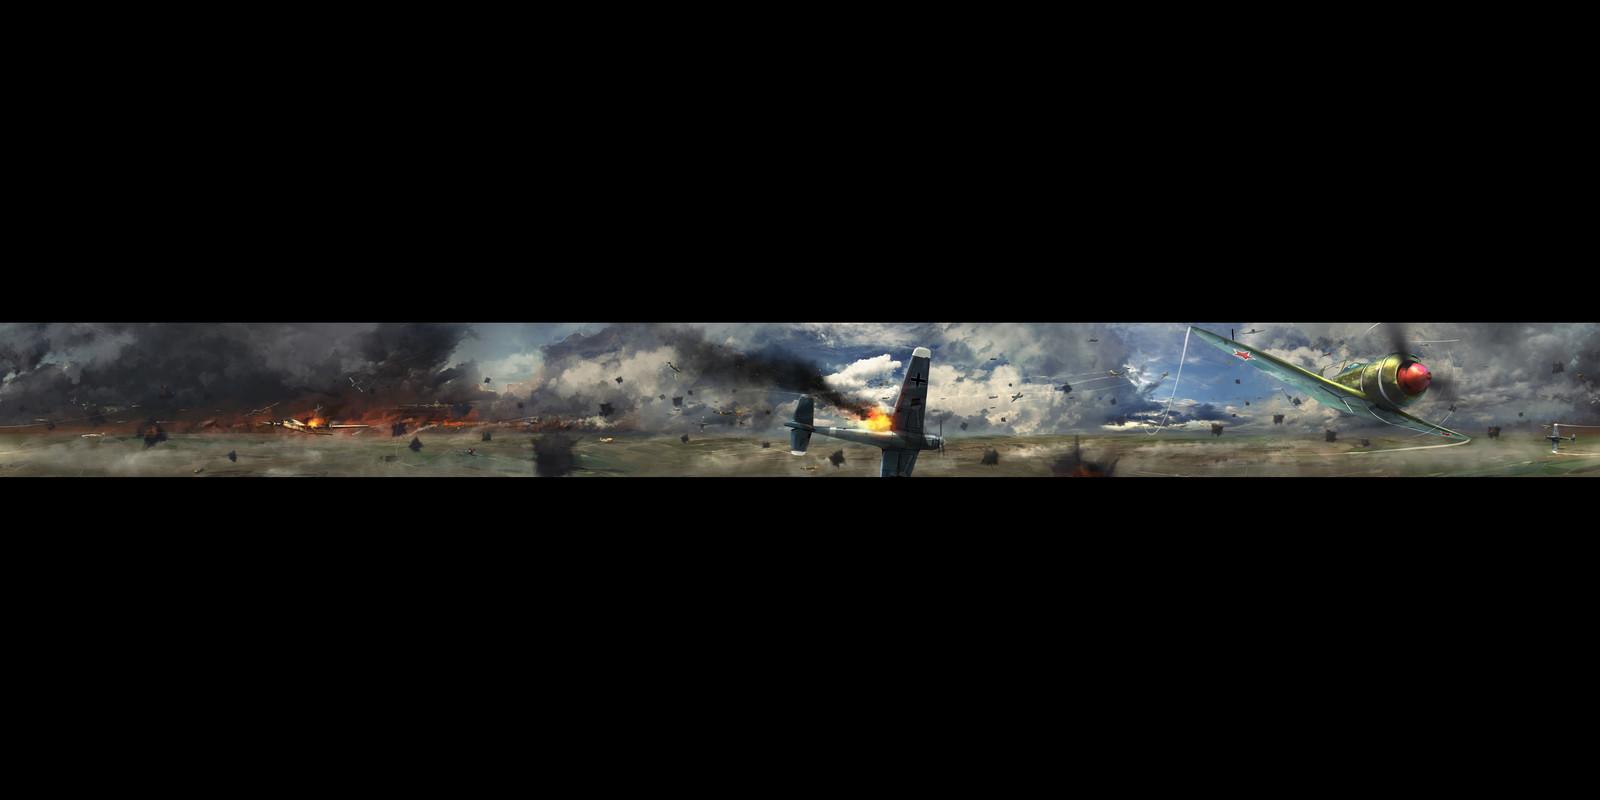 Sky Battle keyframe art